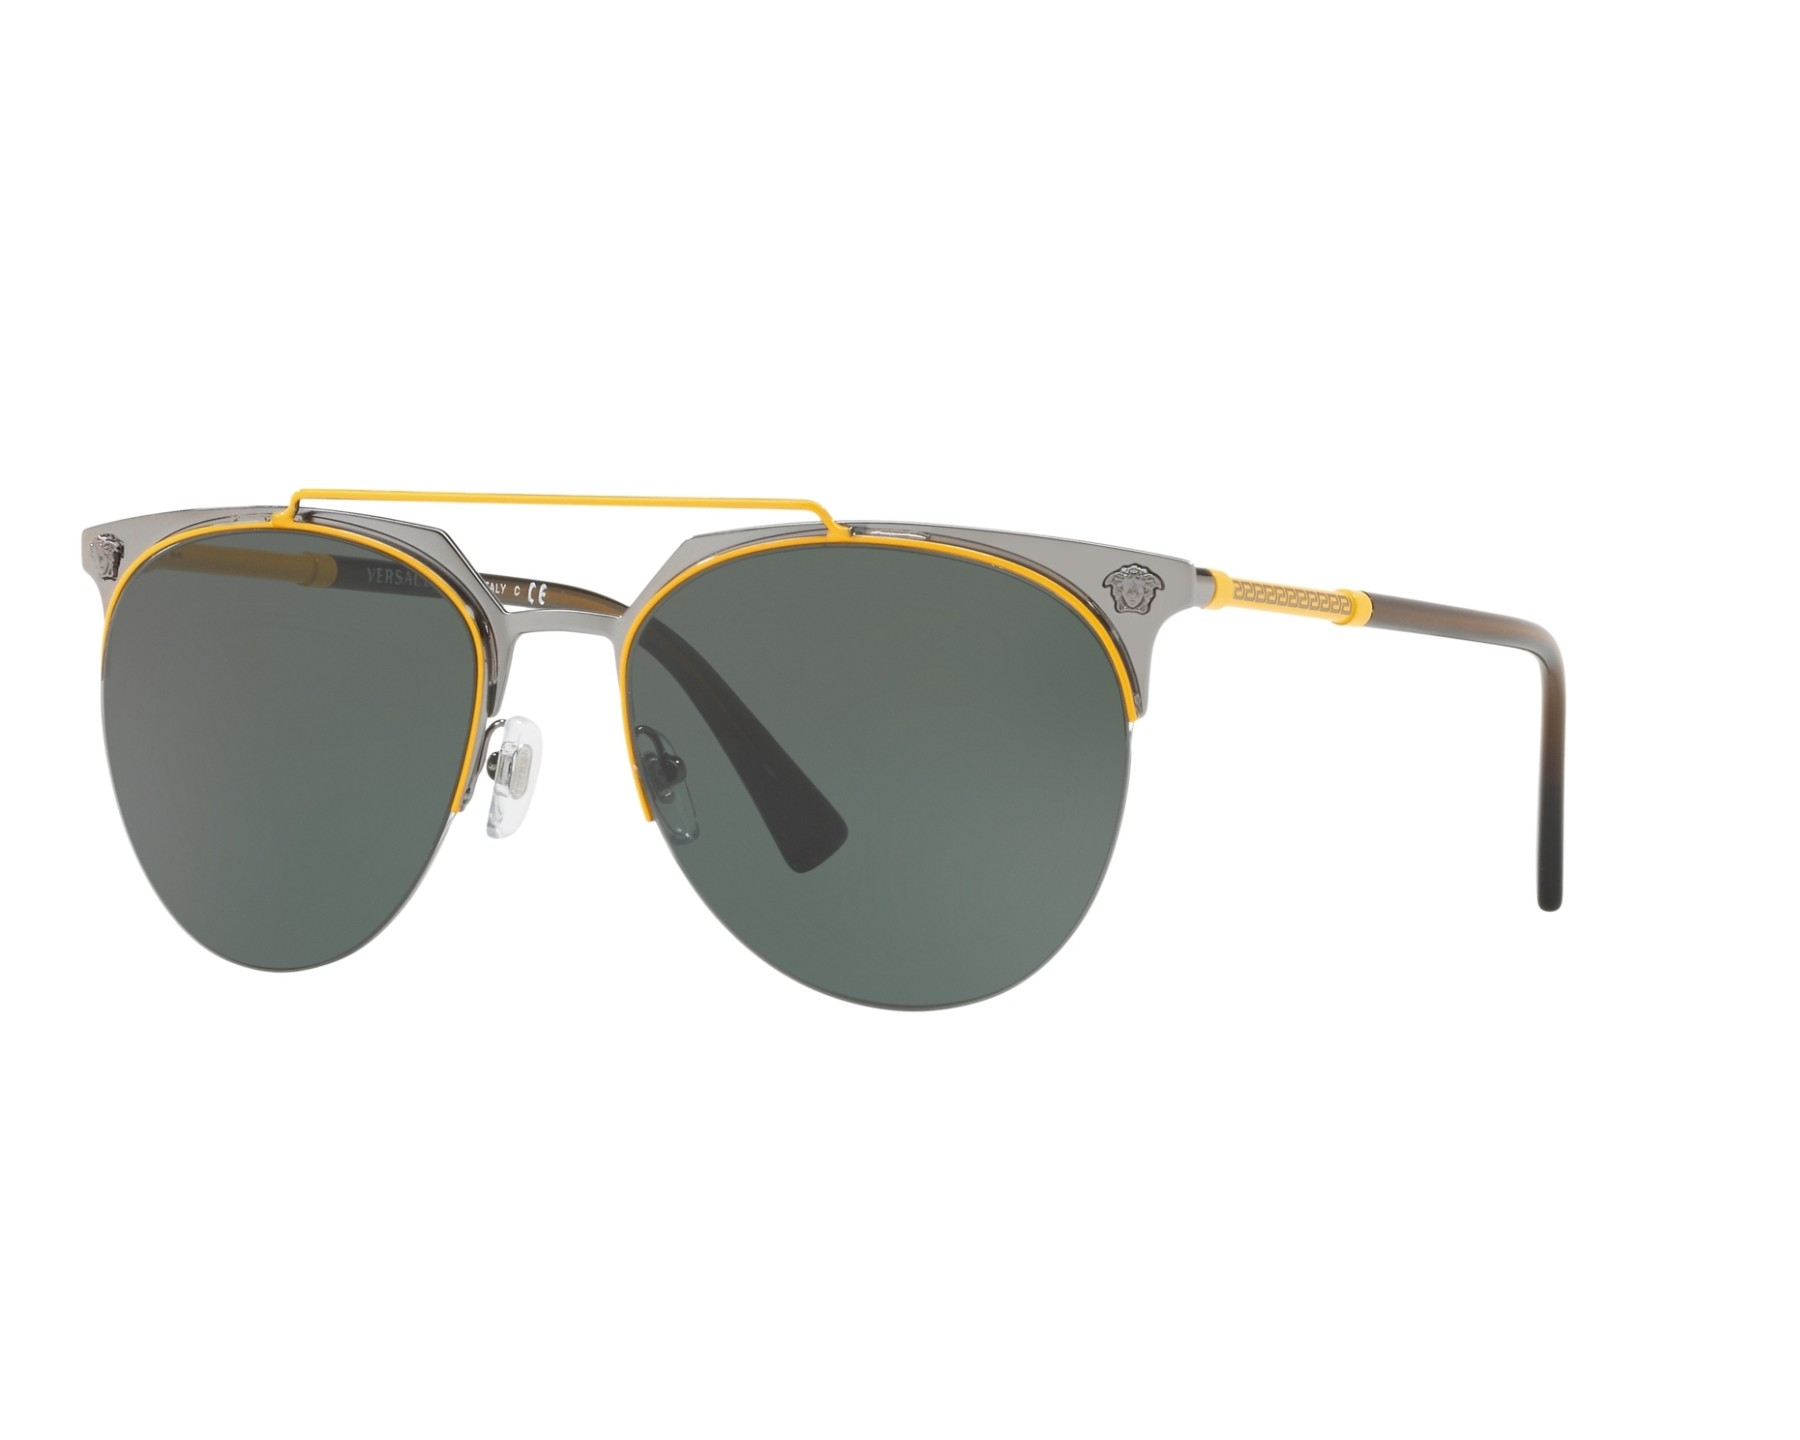 81b57e415f Sunglasses Versace VE-2181 100171 - Gun Yellow